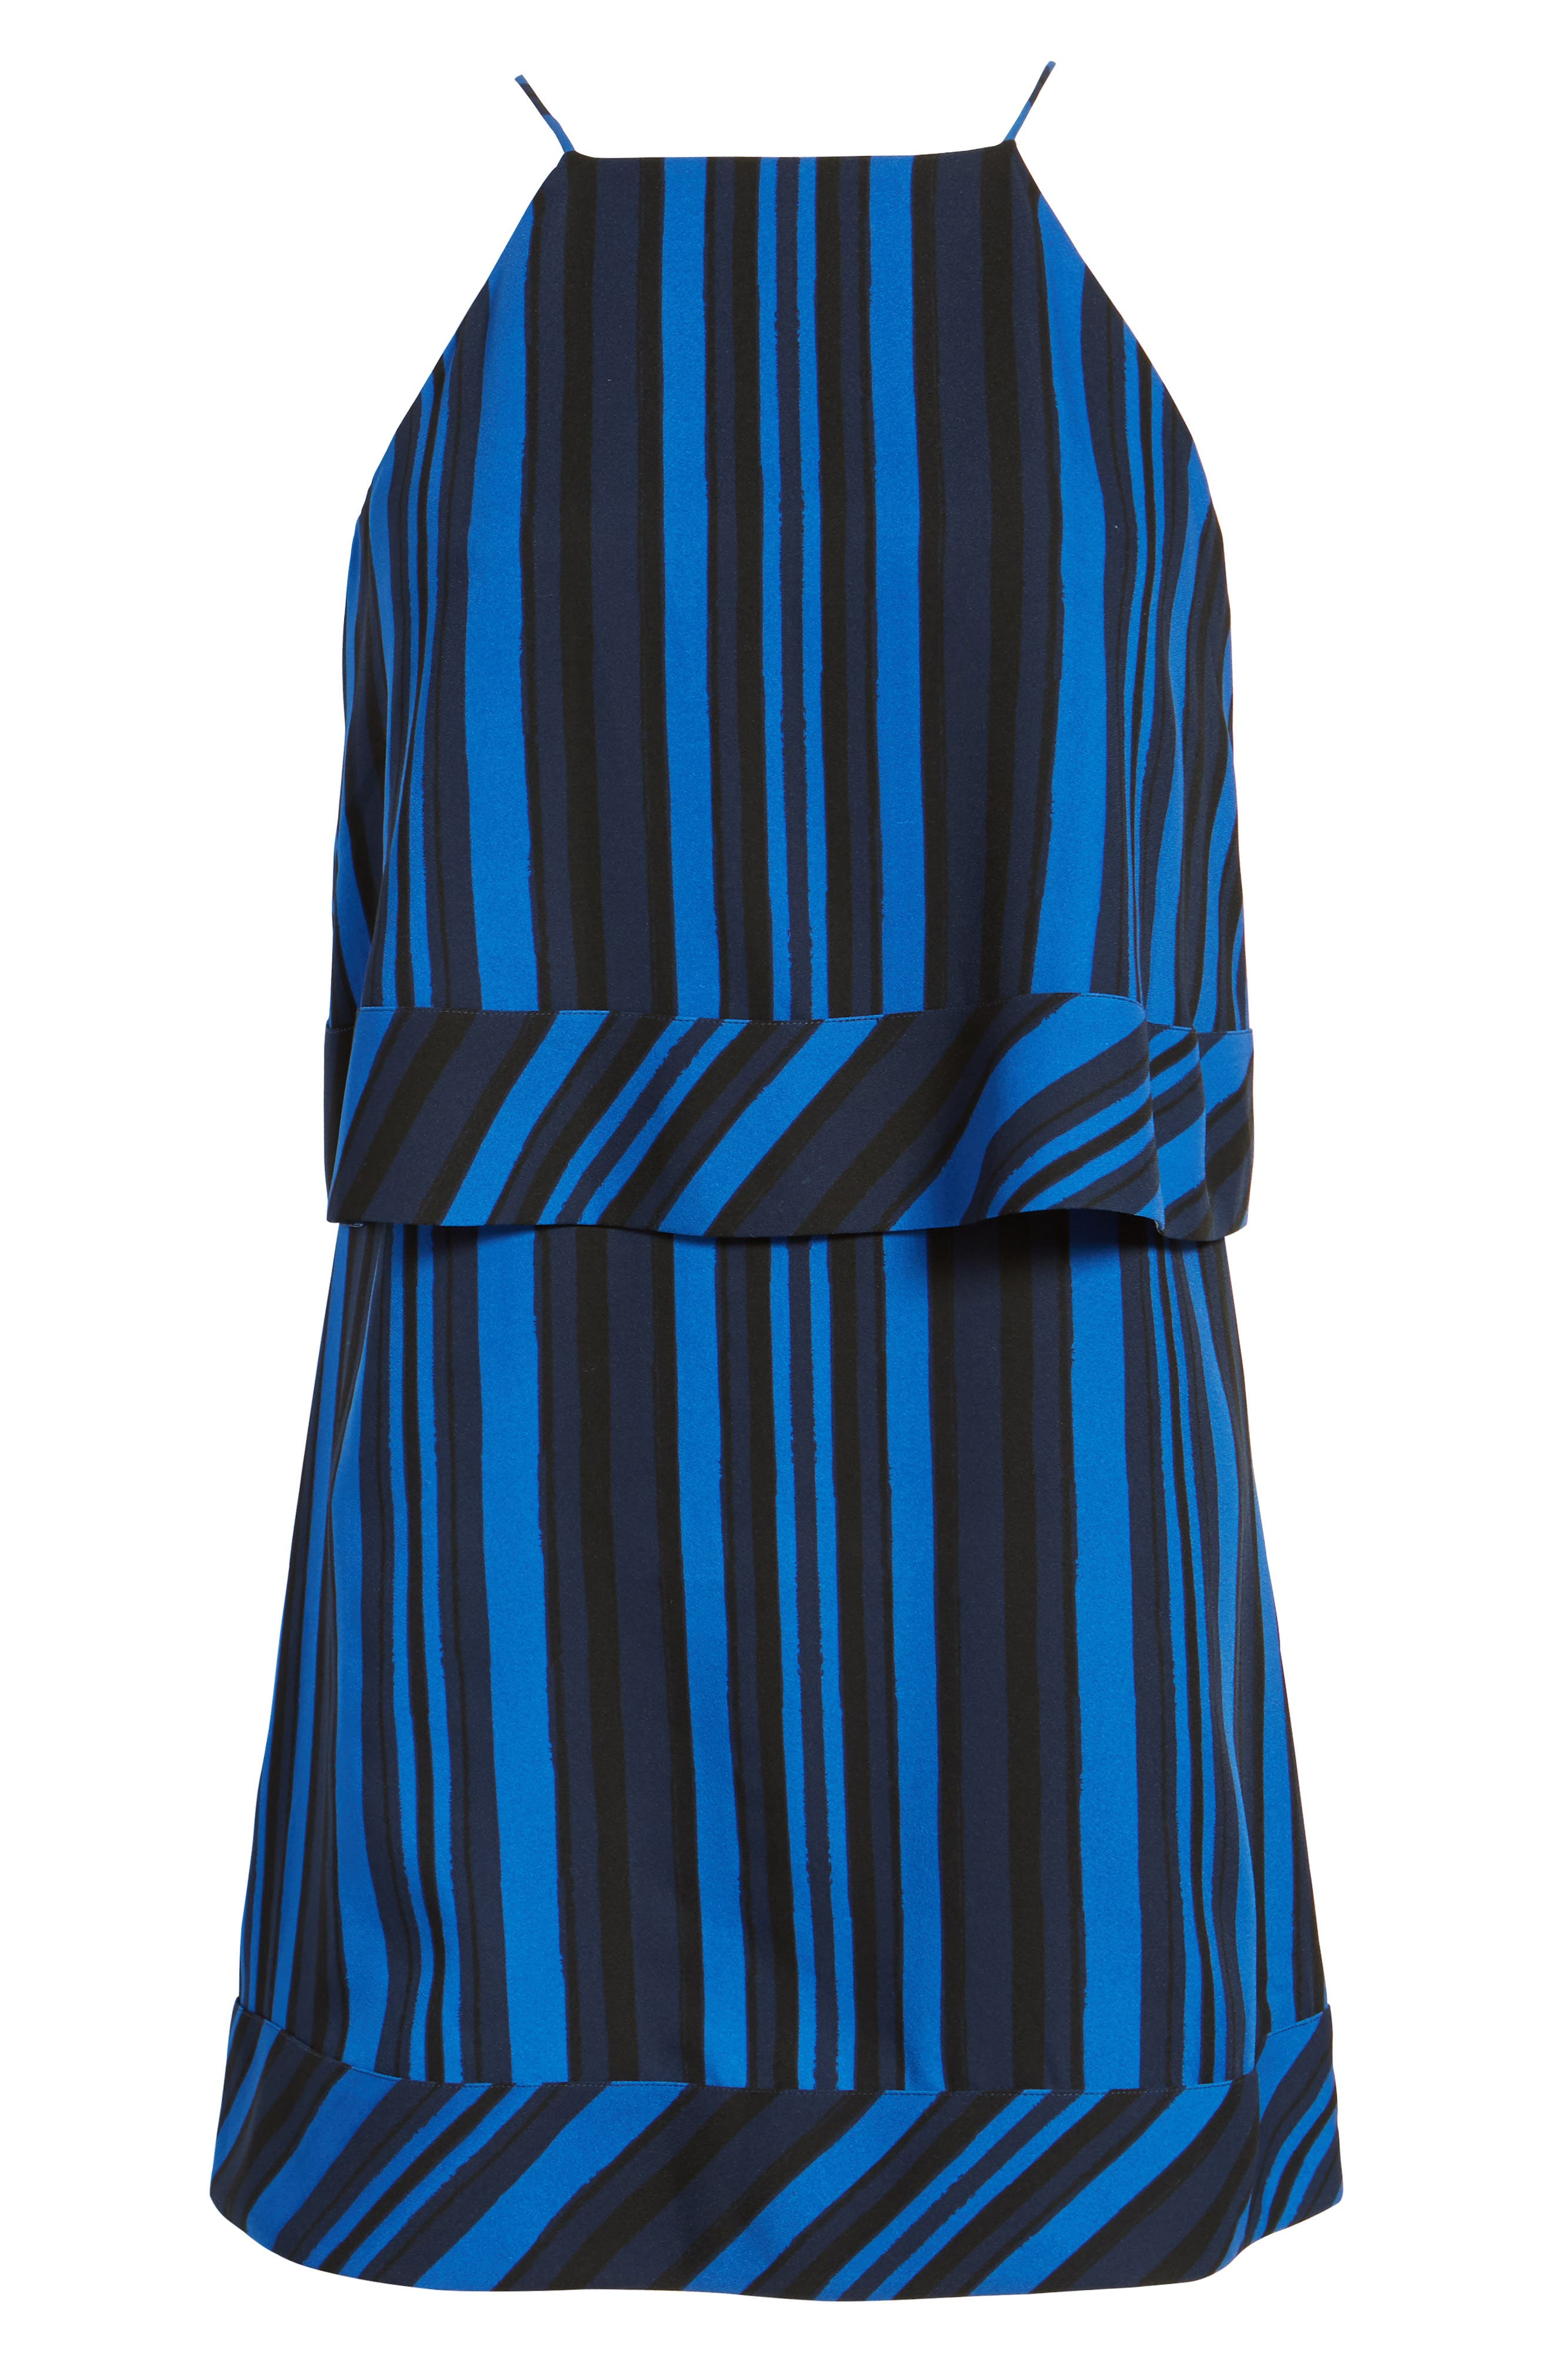 Callie Tiered Shift Dress,                             Alternate thumbnail 6, color,                             Blue Stripe Print